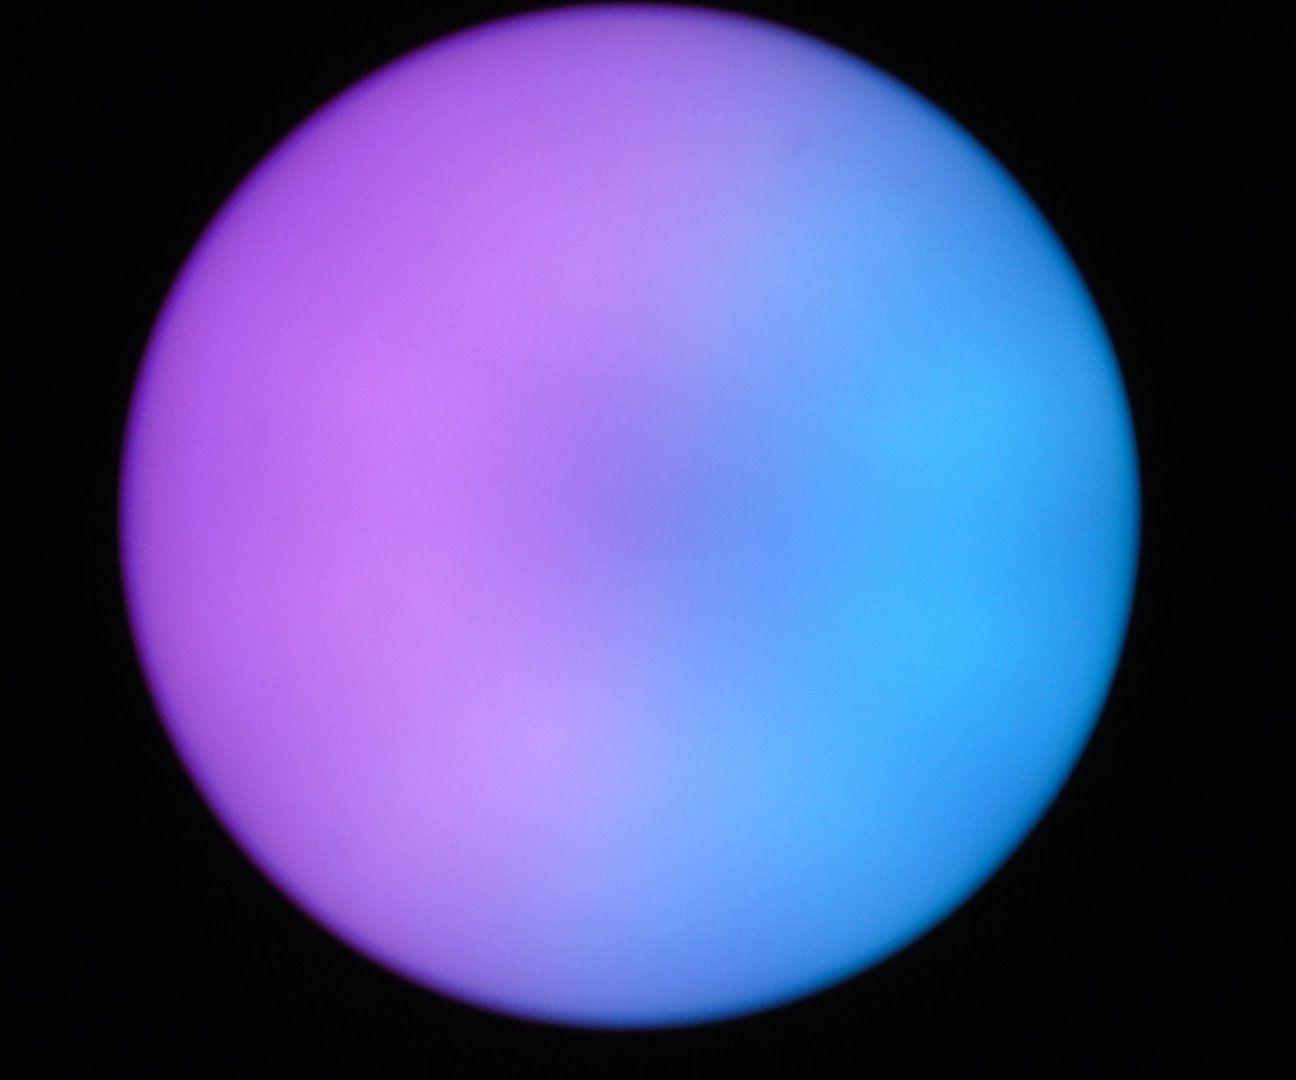 White LED bulb into a bi-color LED bulb